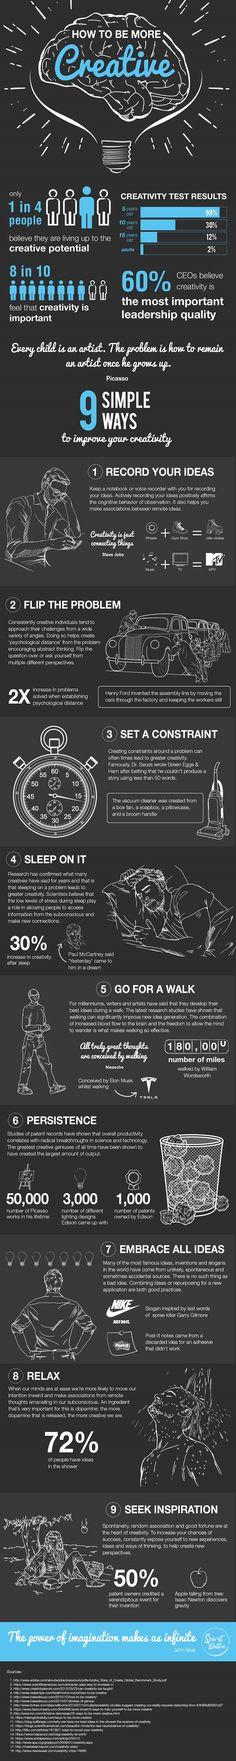 Infographic: Nine Simple Ways To Be More Creative - DesignTAXI.com